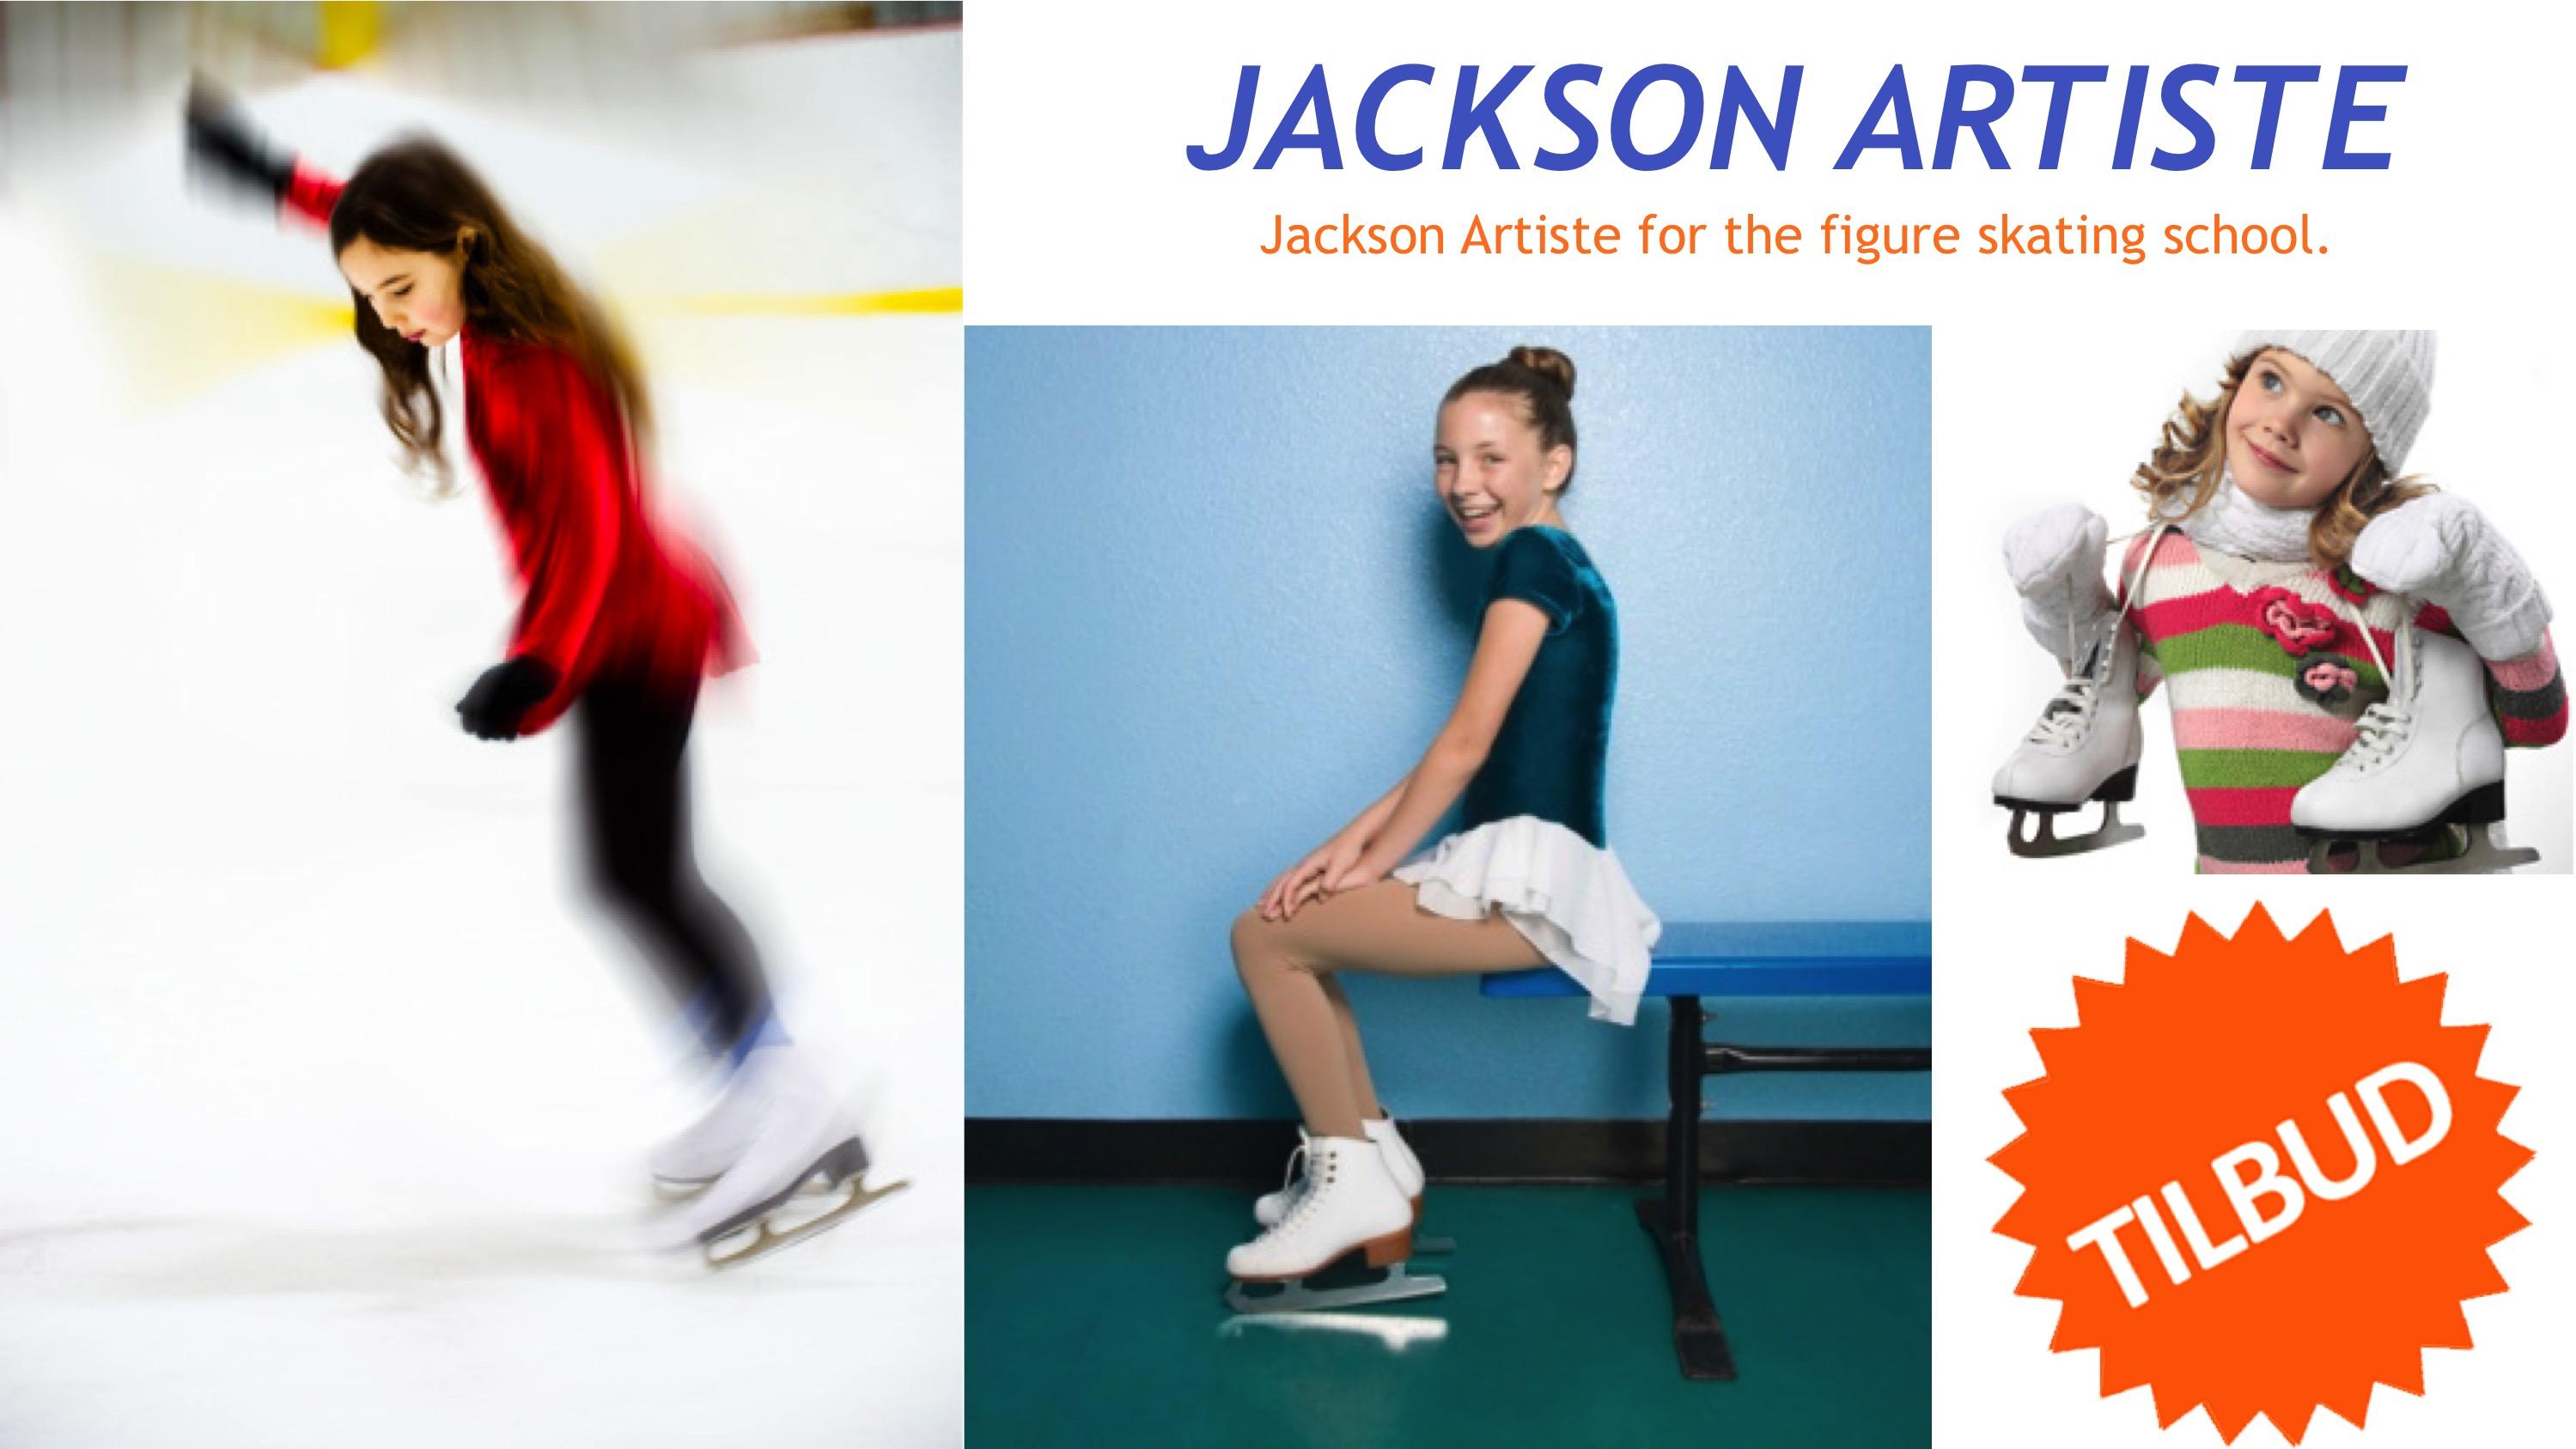 Jackson artiste